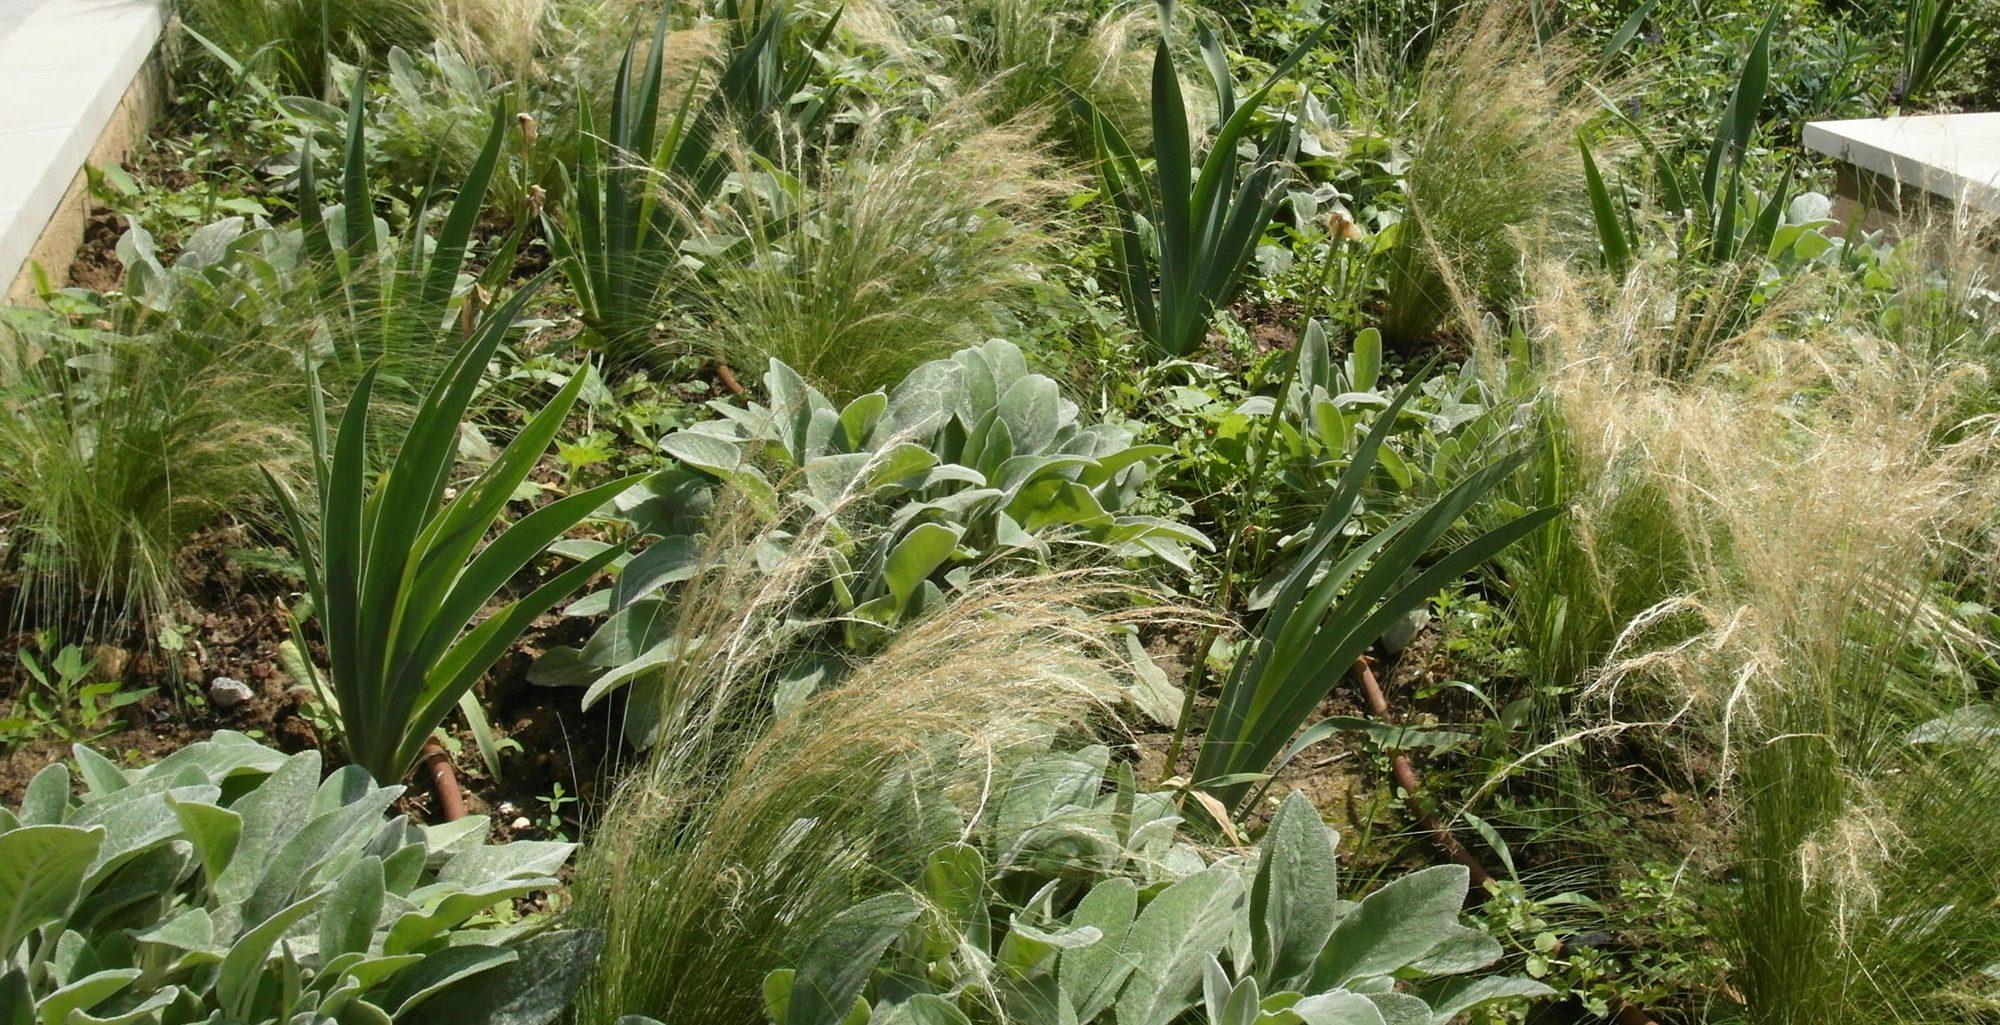 Jardinières sur dalle : Stipa tenuissima, Stachys byzantina, Iris barbata- nana